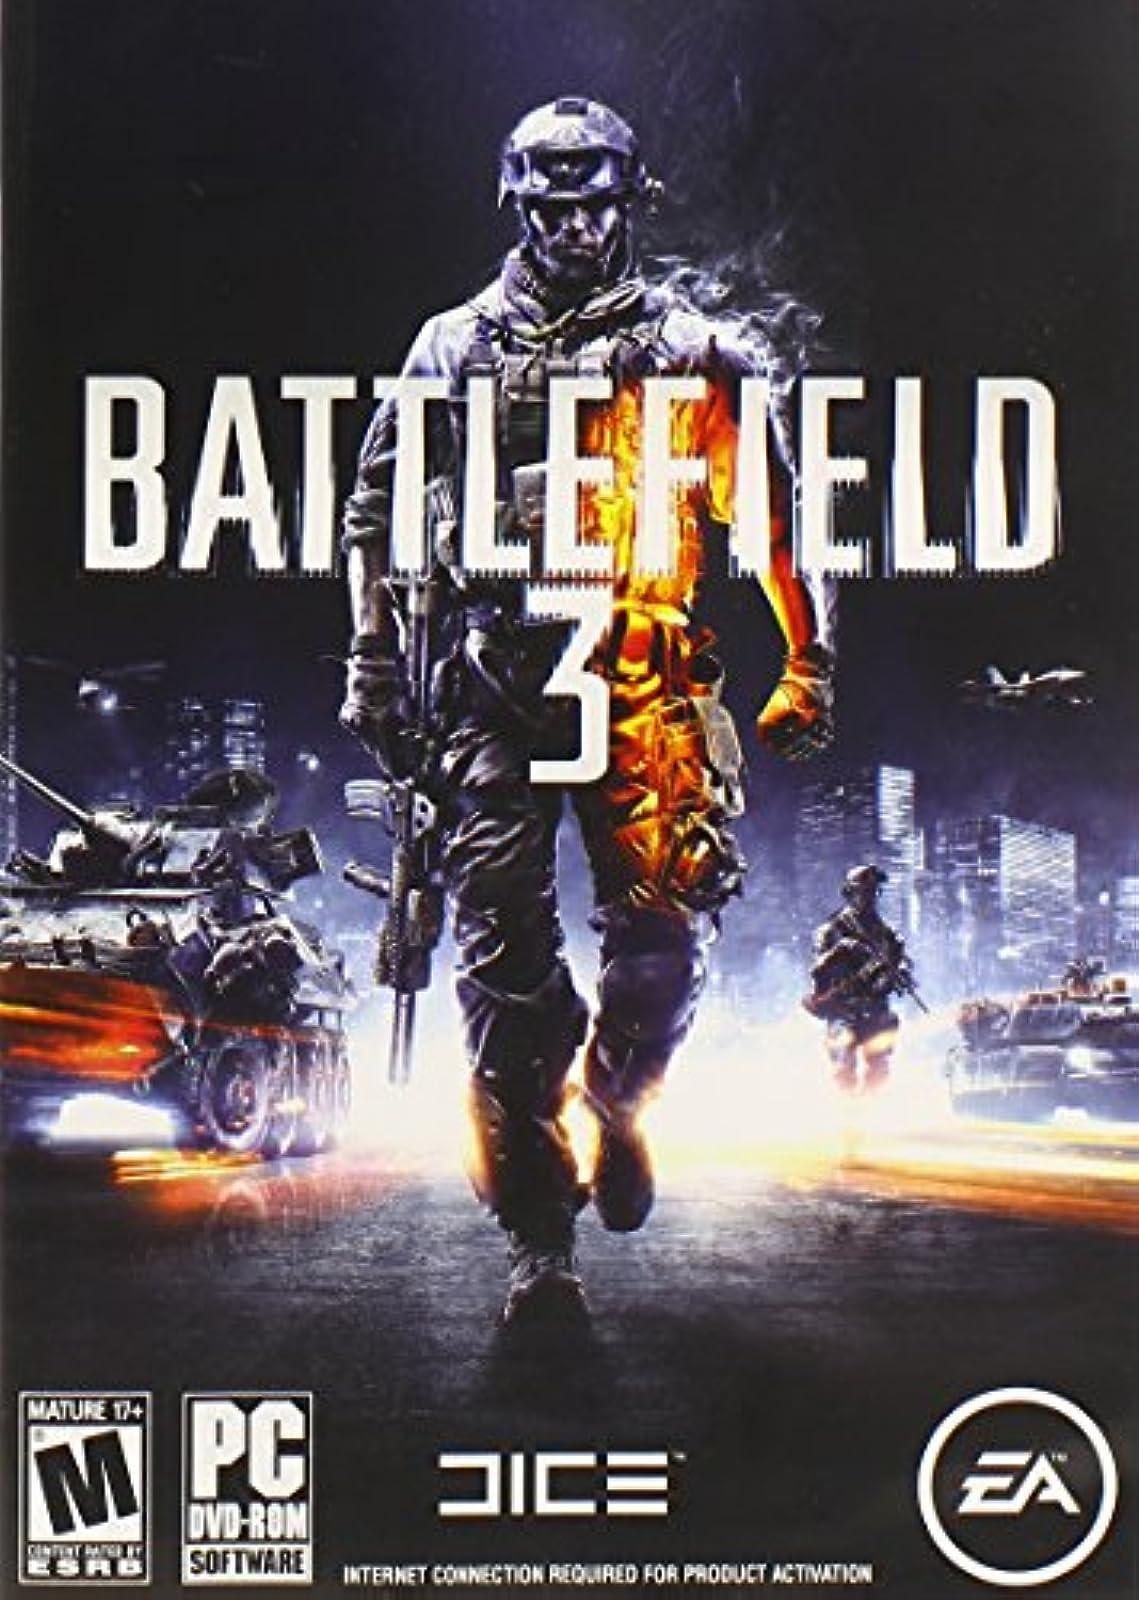 Battlefield 3 PC Software